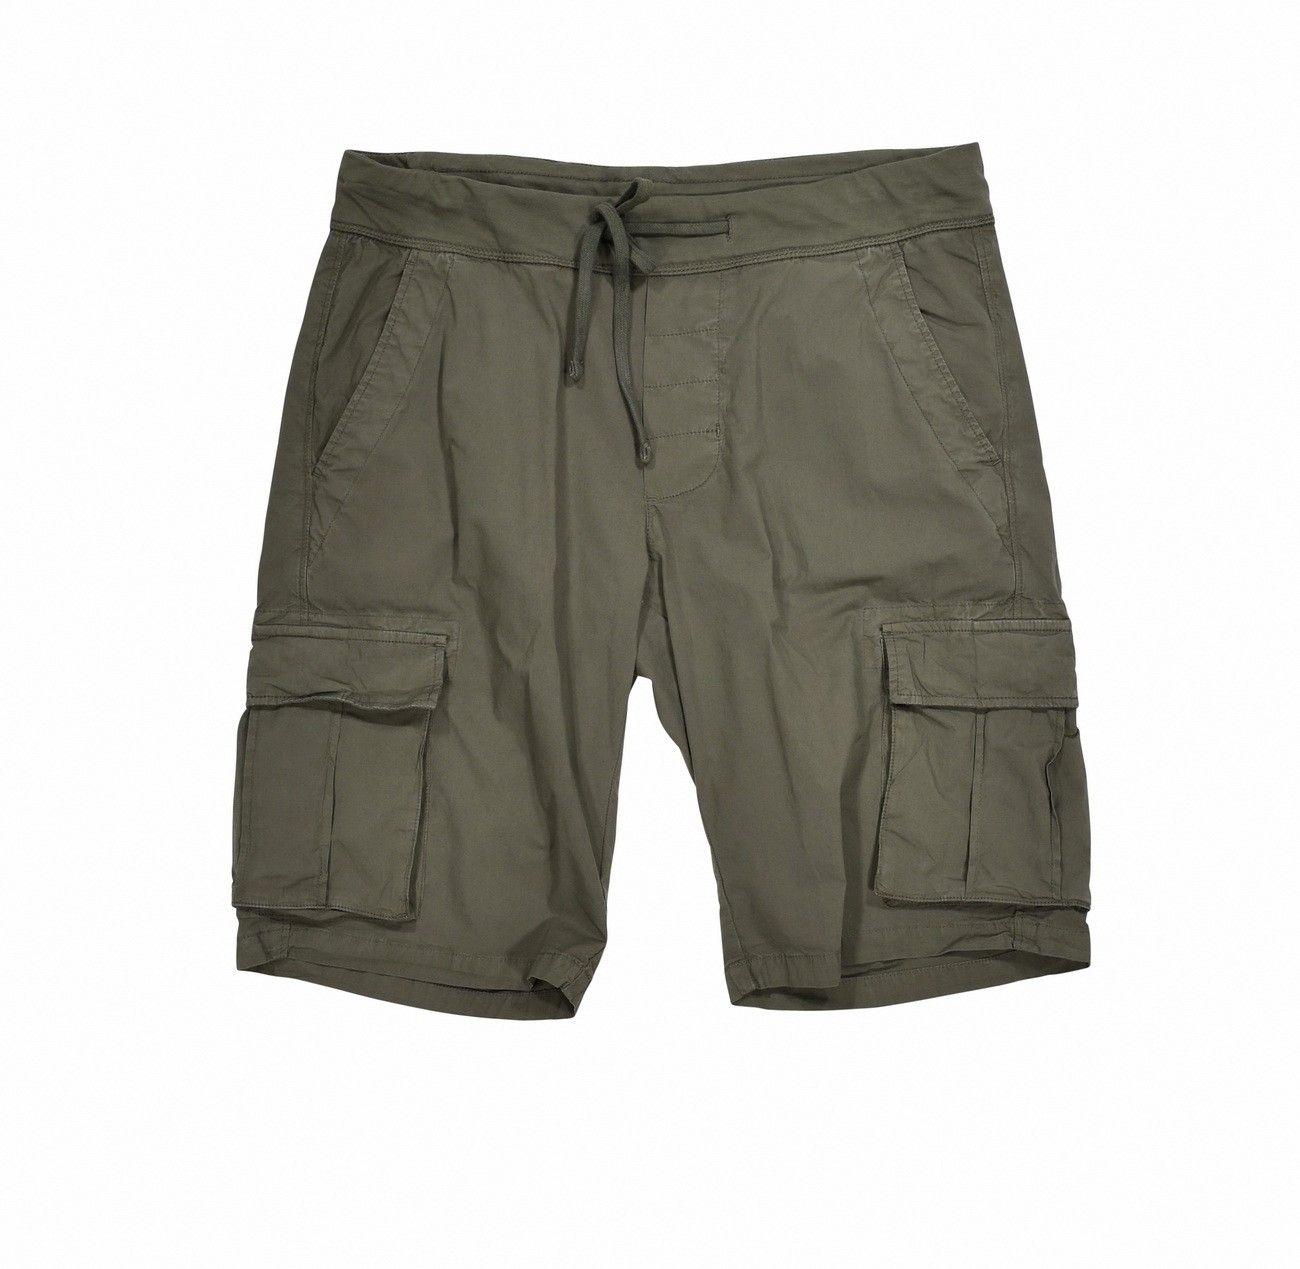 WOOLRICH - Herren Shorts - Popeline Cargo - Grape Leaf